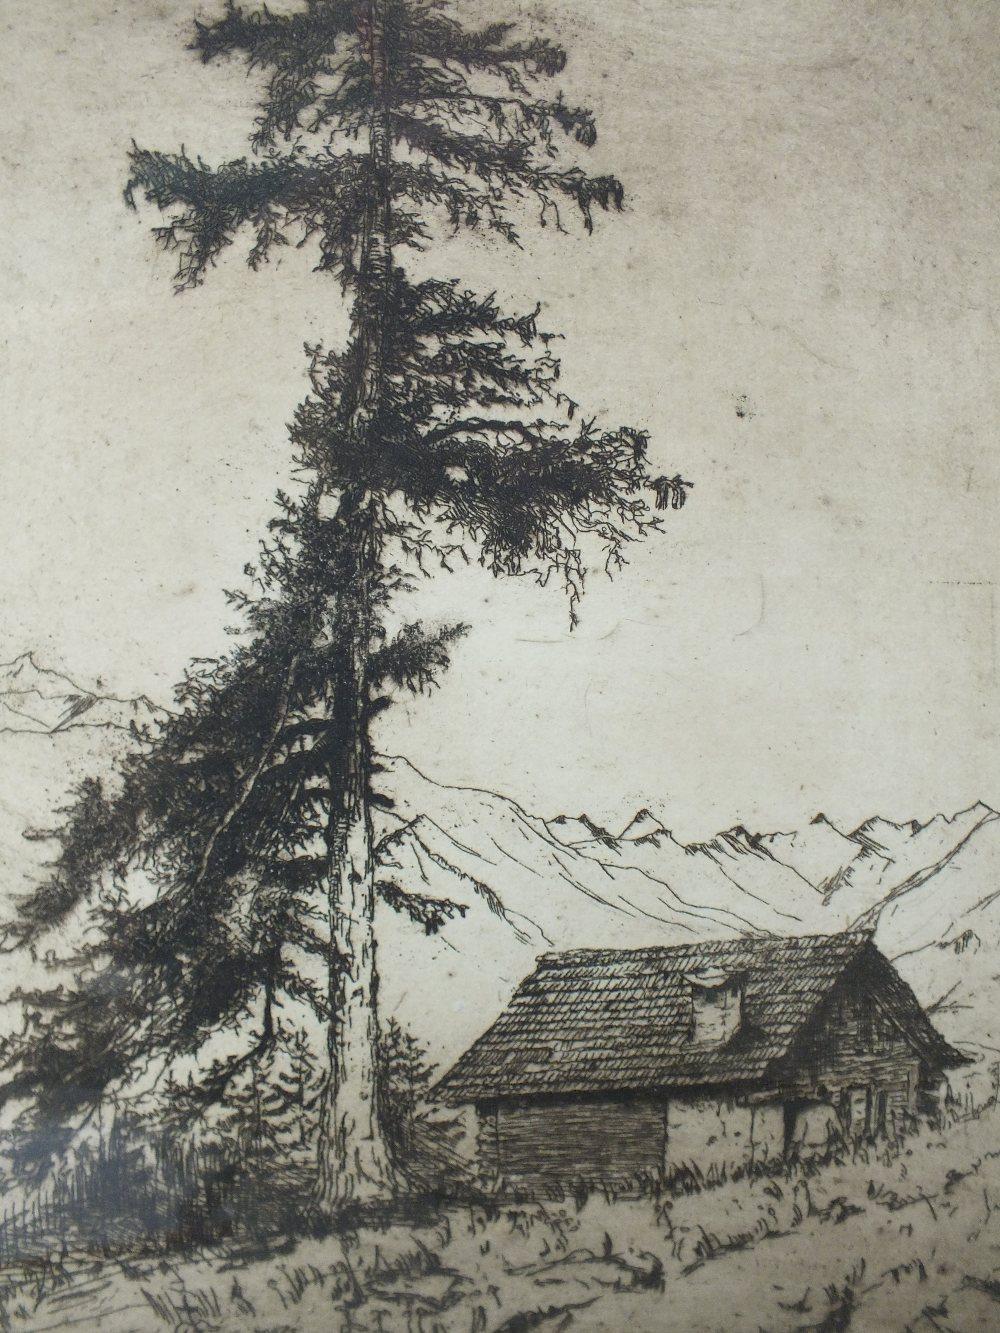 Lot 26 - HENRIETTA JOHANNA REUCHLIN-LUCARDIE (1877-1970). Dutch school, a figure and hut in Montana, see